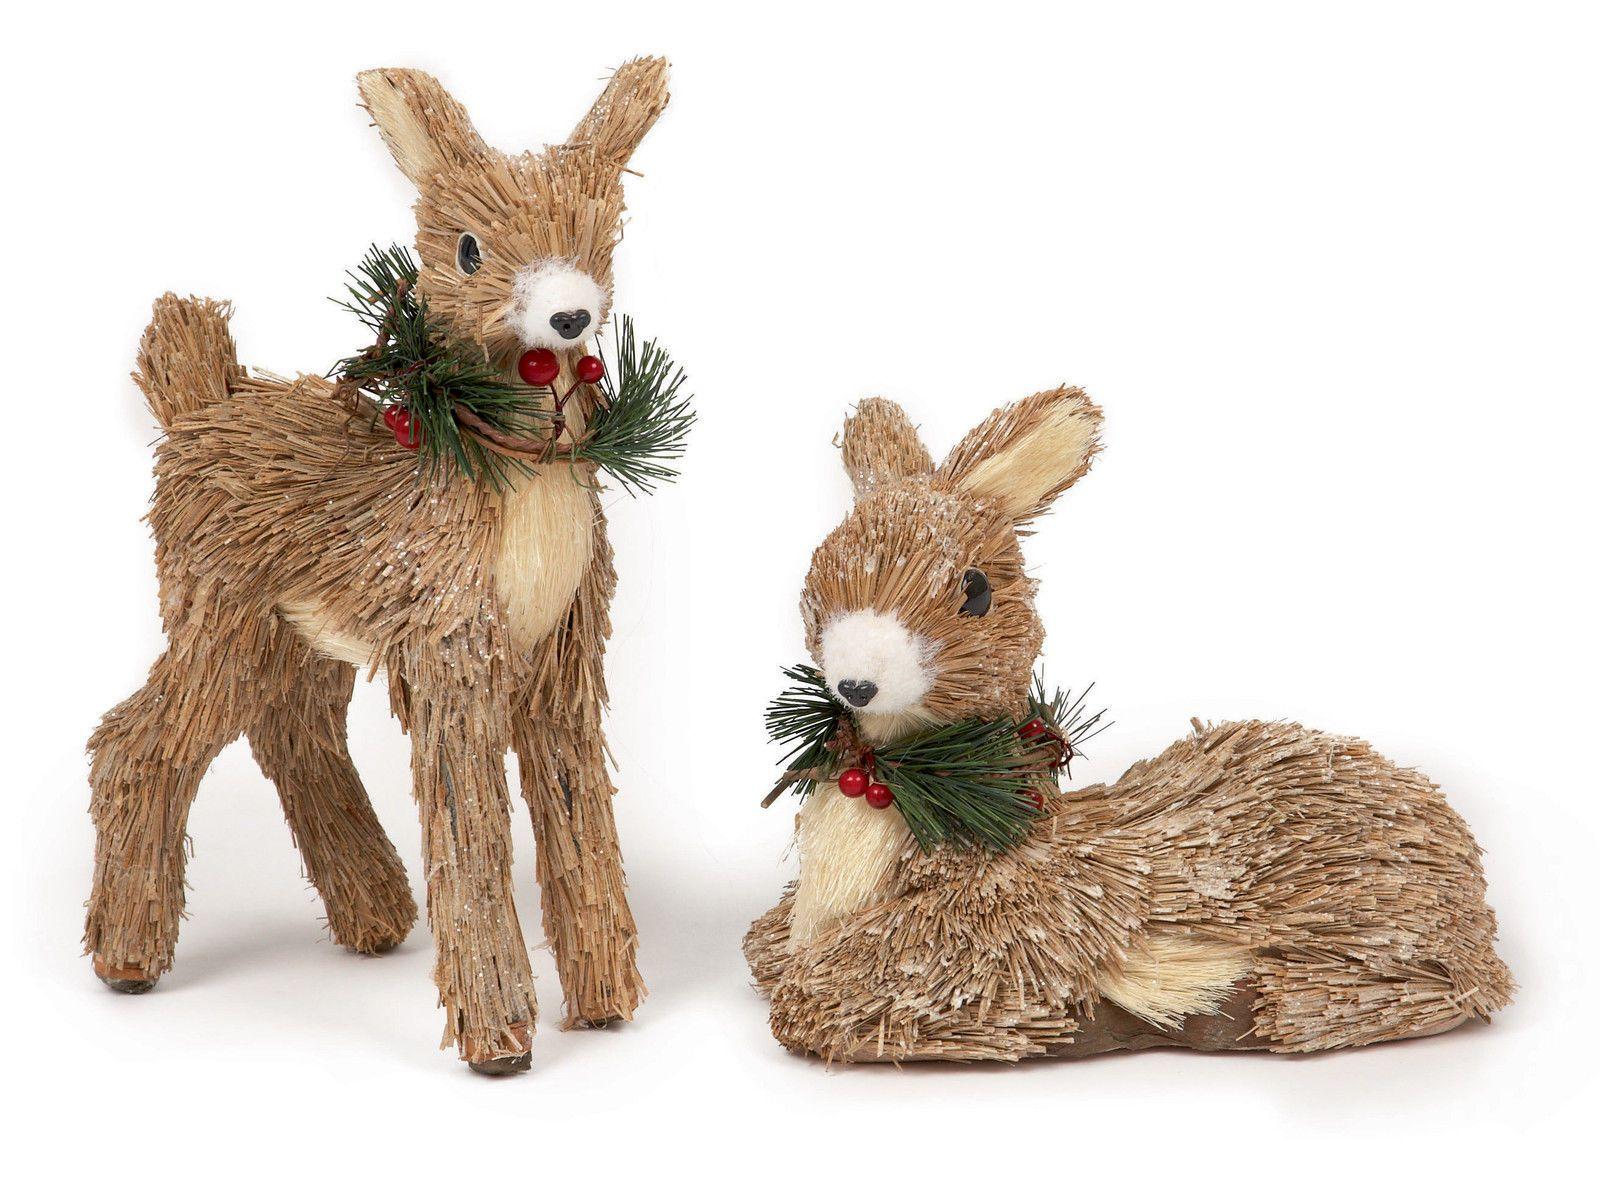 Premier Rustic Straw Reindeer 25cm And 18cm Christmas Decoration Christmas Decorations Reindeer Rustic Christmas